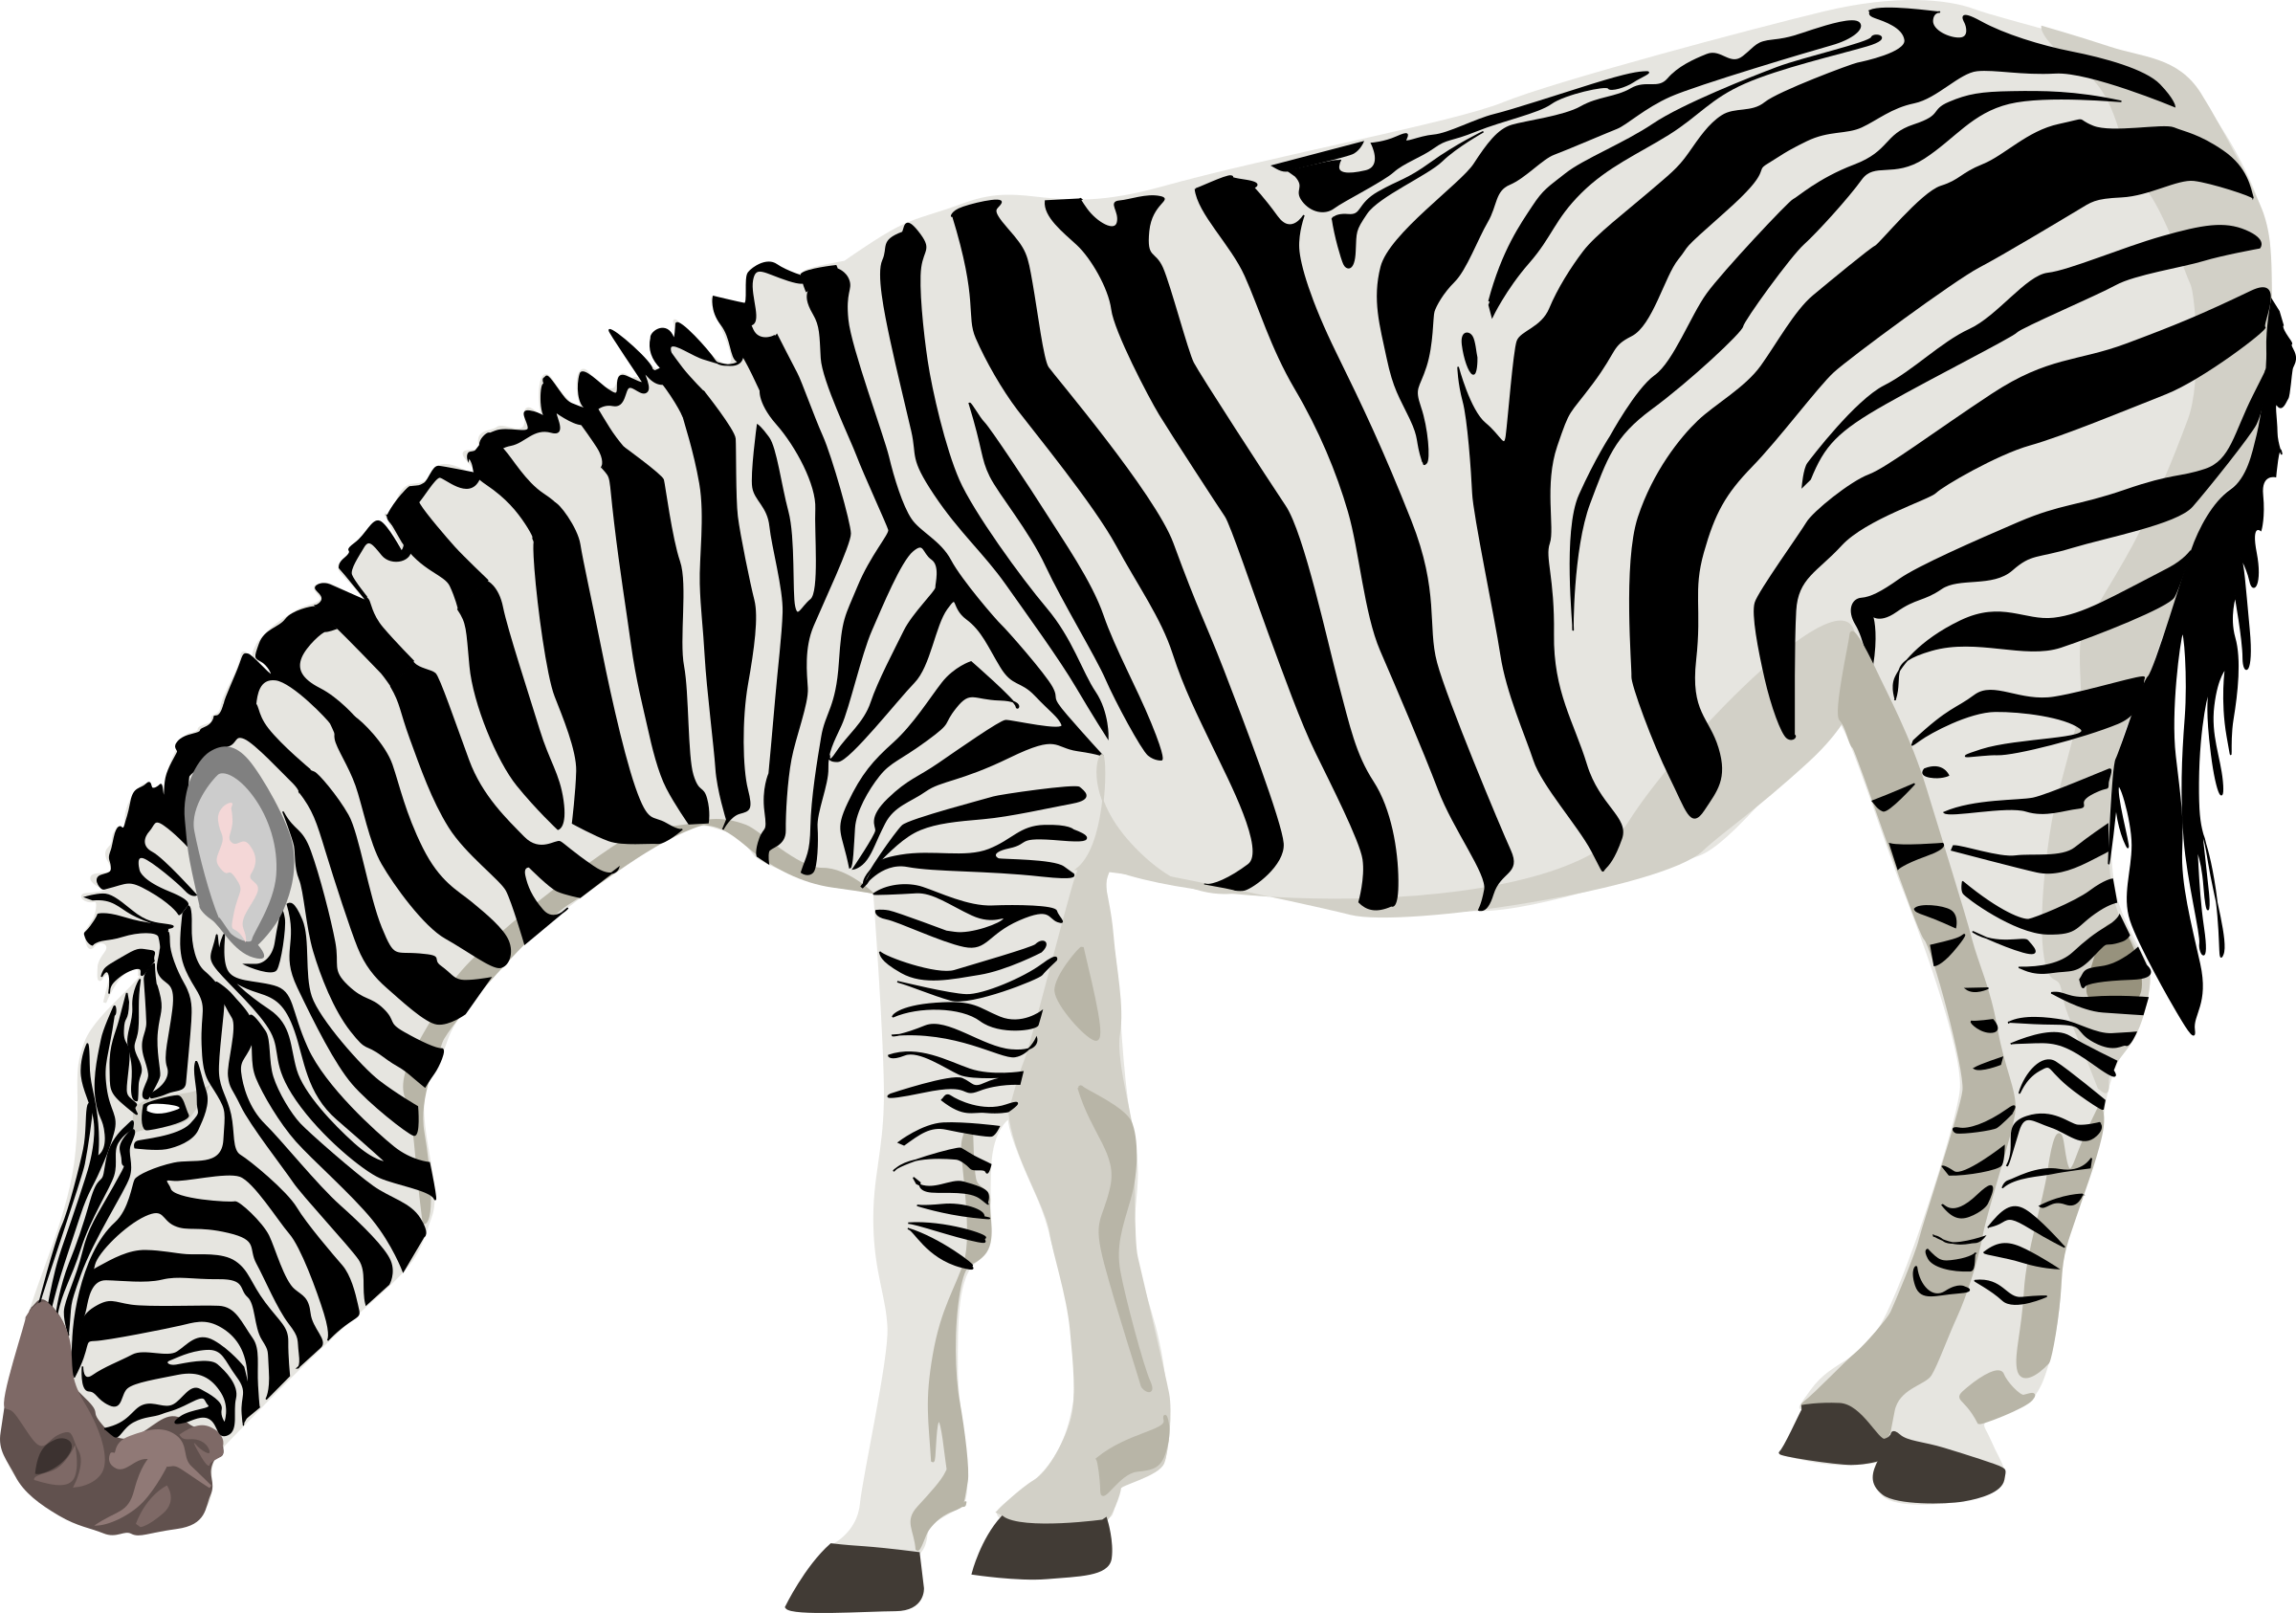 Zebra Png Photos - Zebra, Transparent background PNG HD thumbnail